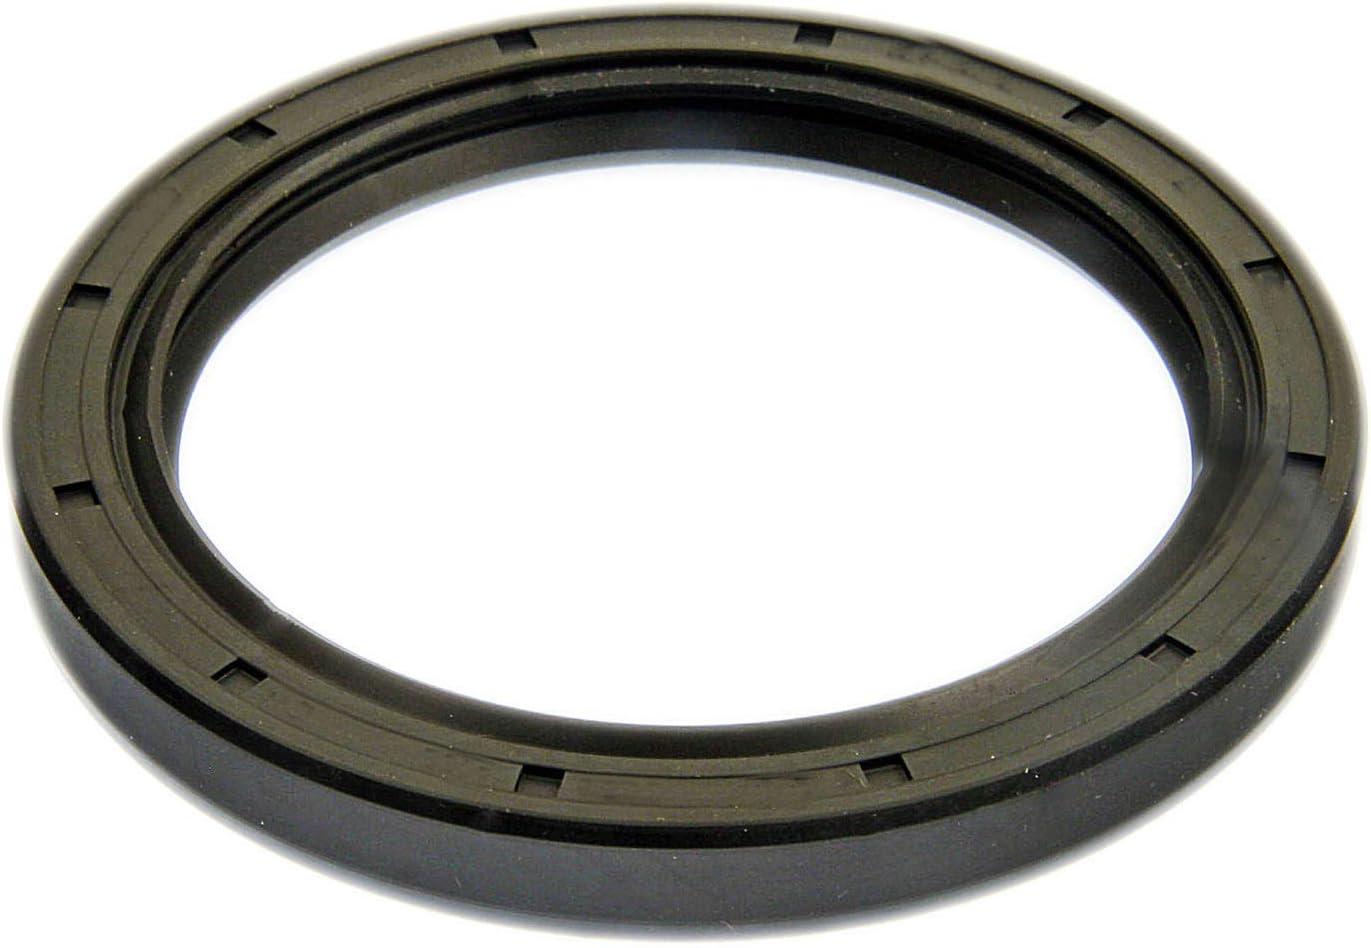 ACDelco 710463 Advantage Crankshaft Front Oil Seal